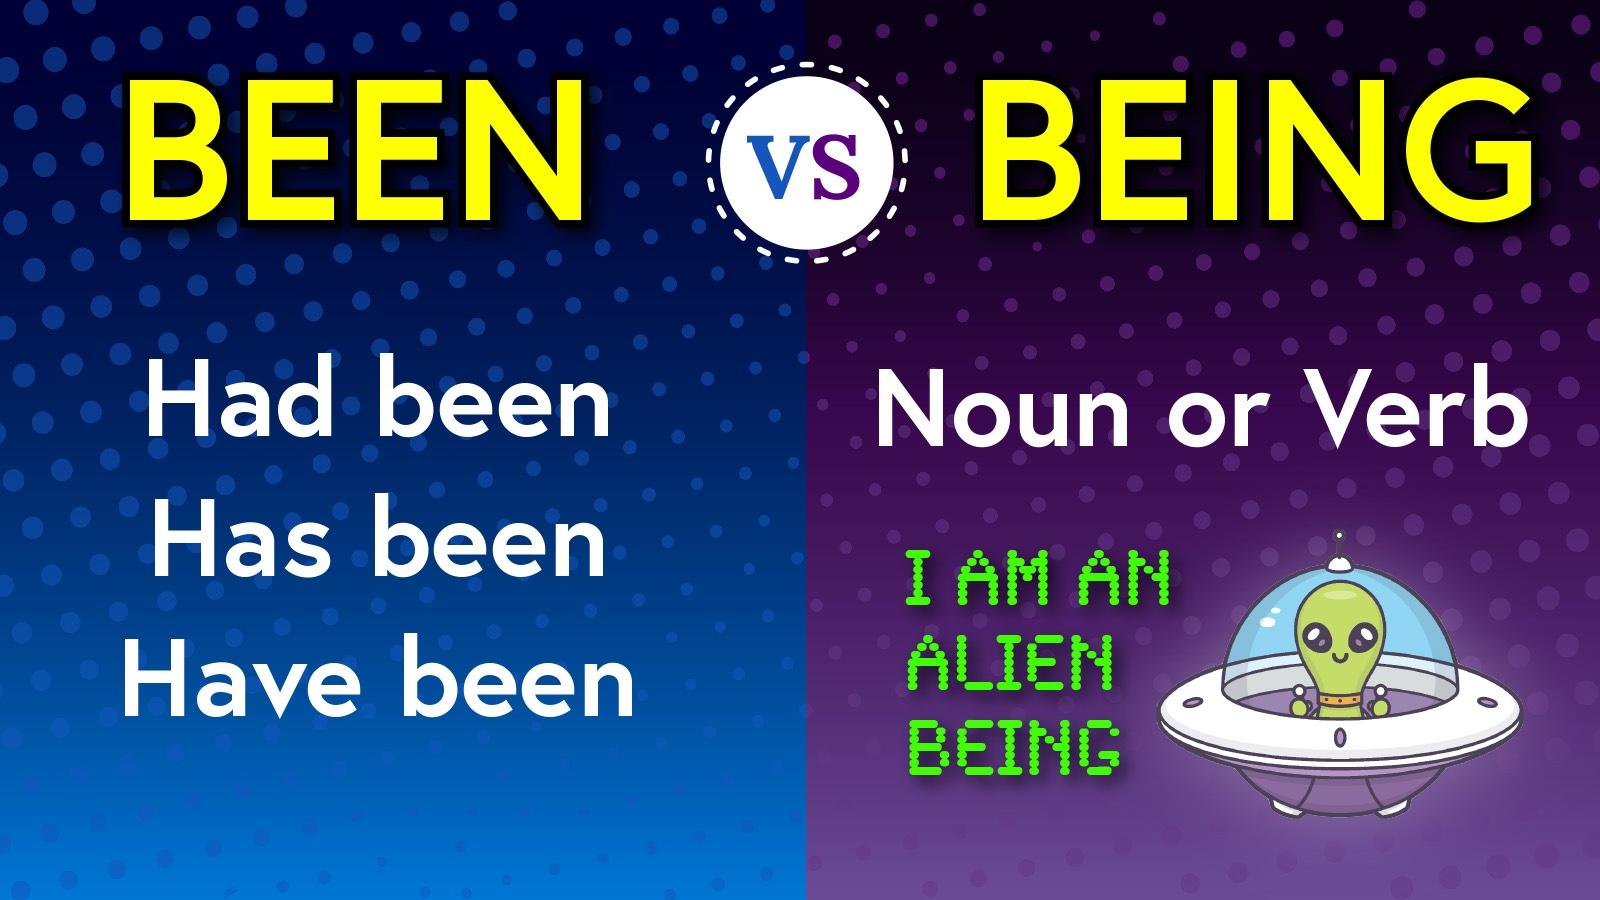 Been vs Being Example